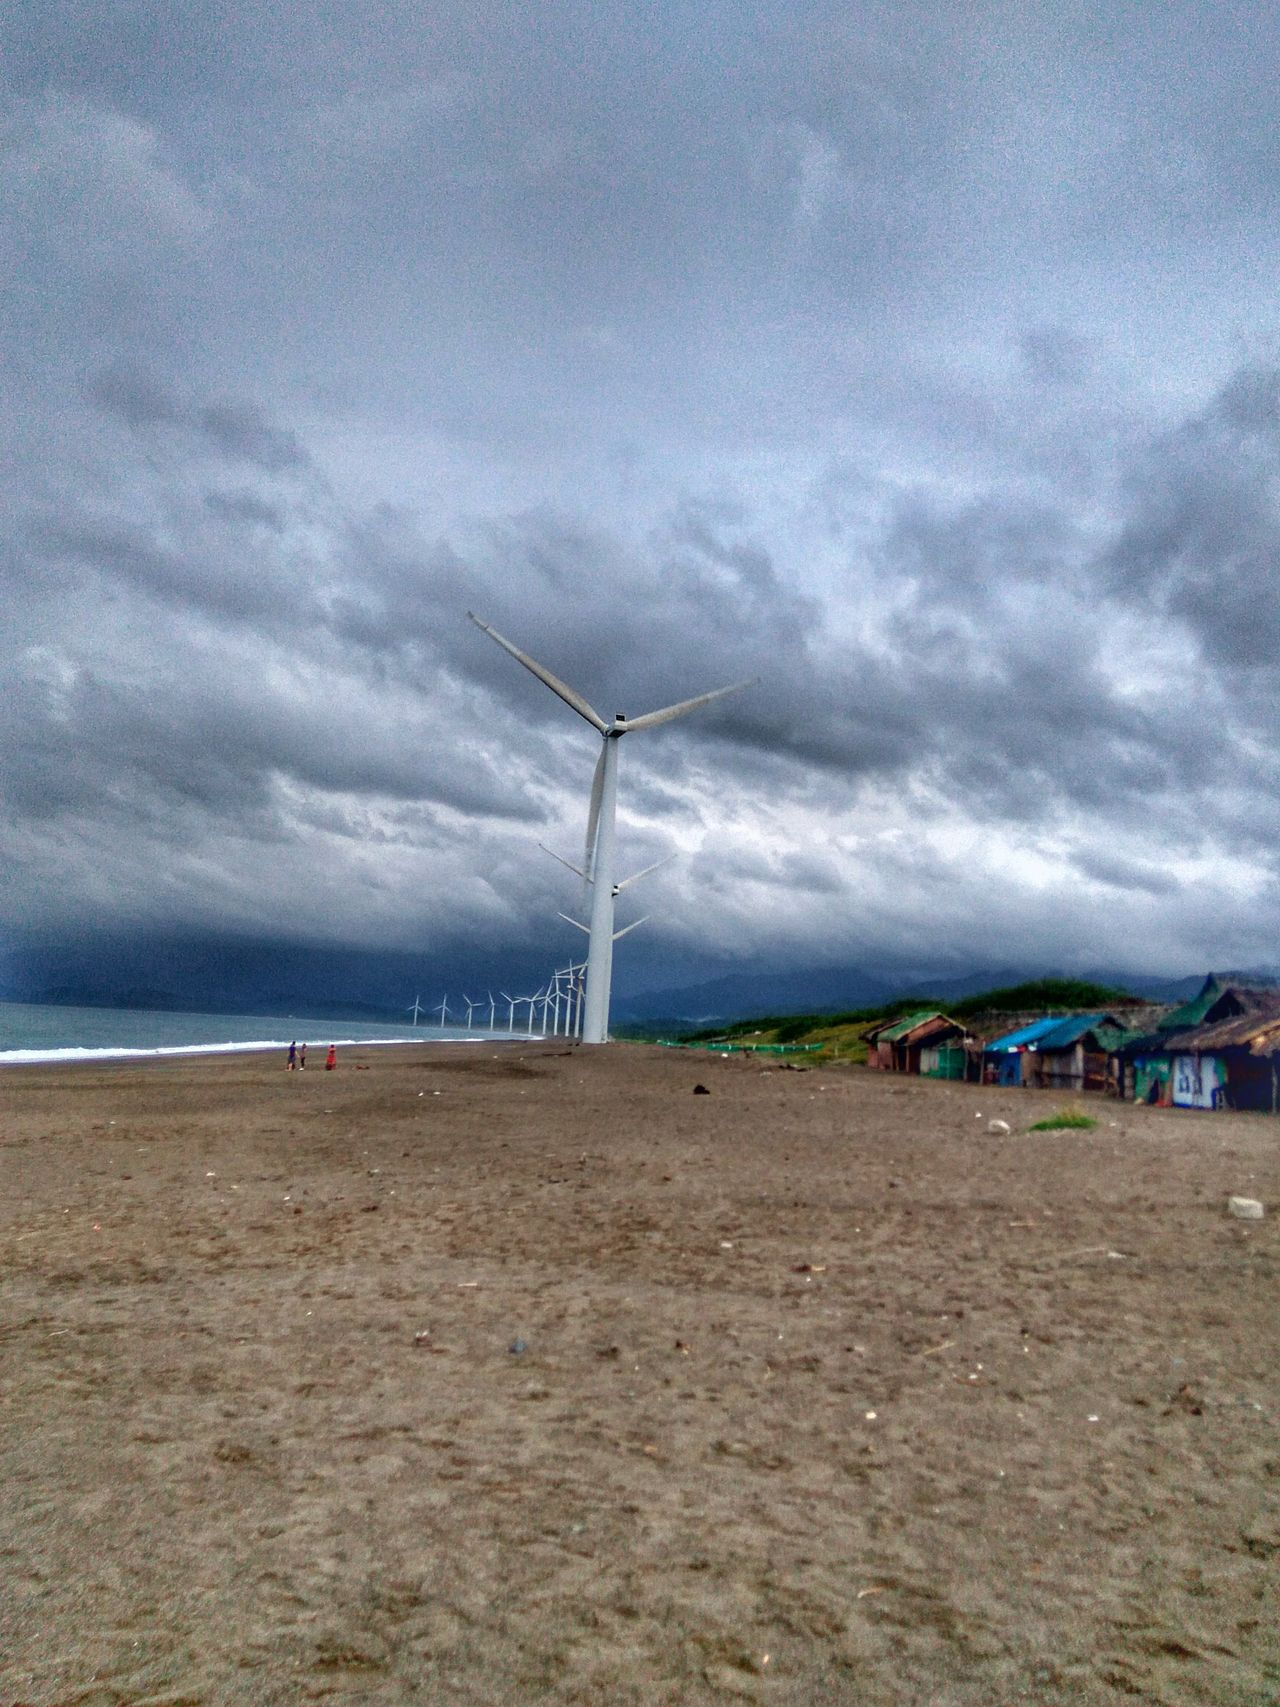 Sky Sea Cloud - Sky Horizon Over Water Water Outdoors Beach DayTravelPhilippines Eyeem Philippines Wind Mill Windmill